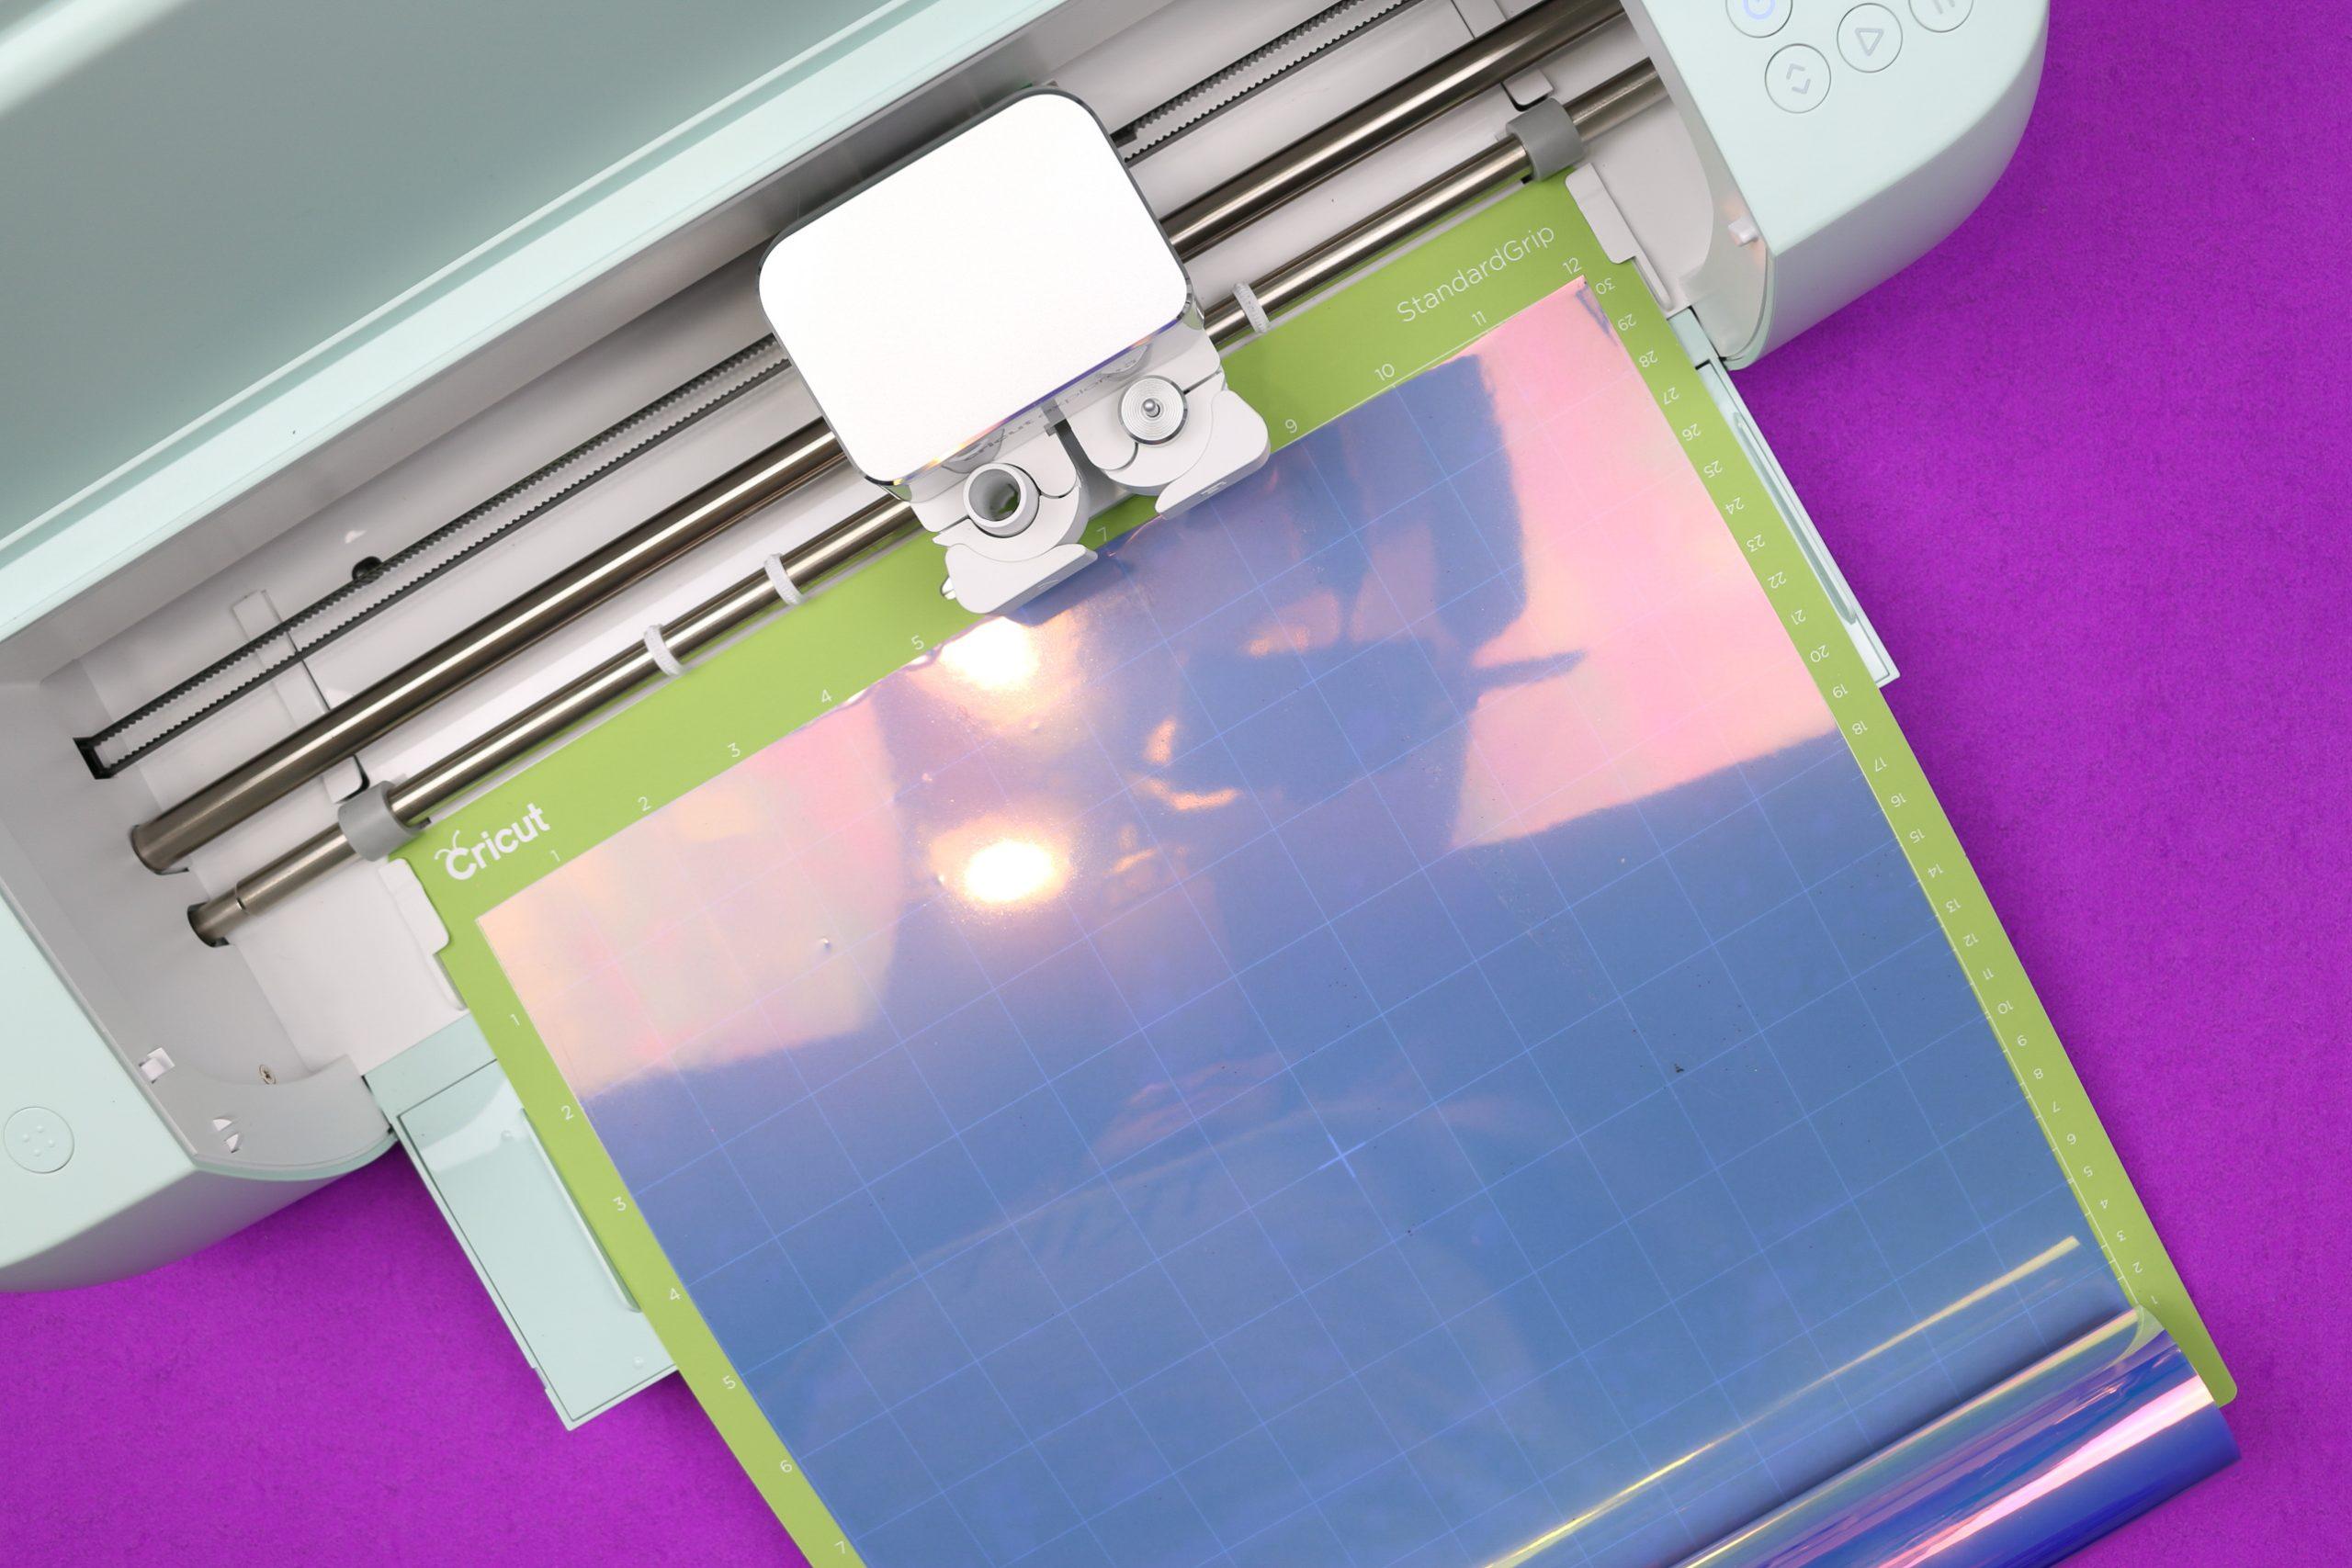 holographic iron on vinyl in a Cricut Explore 3